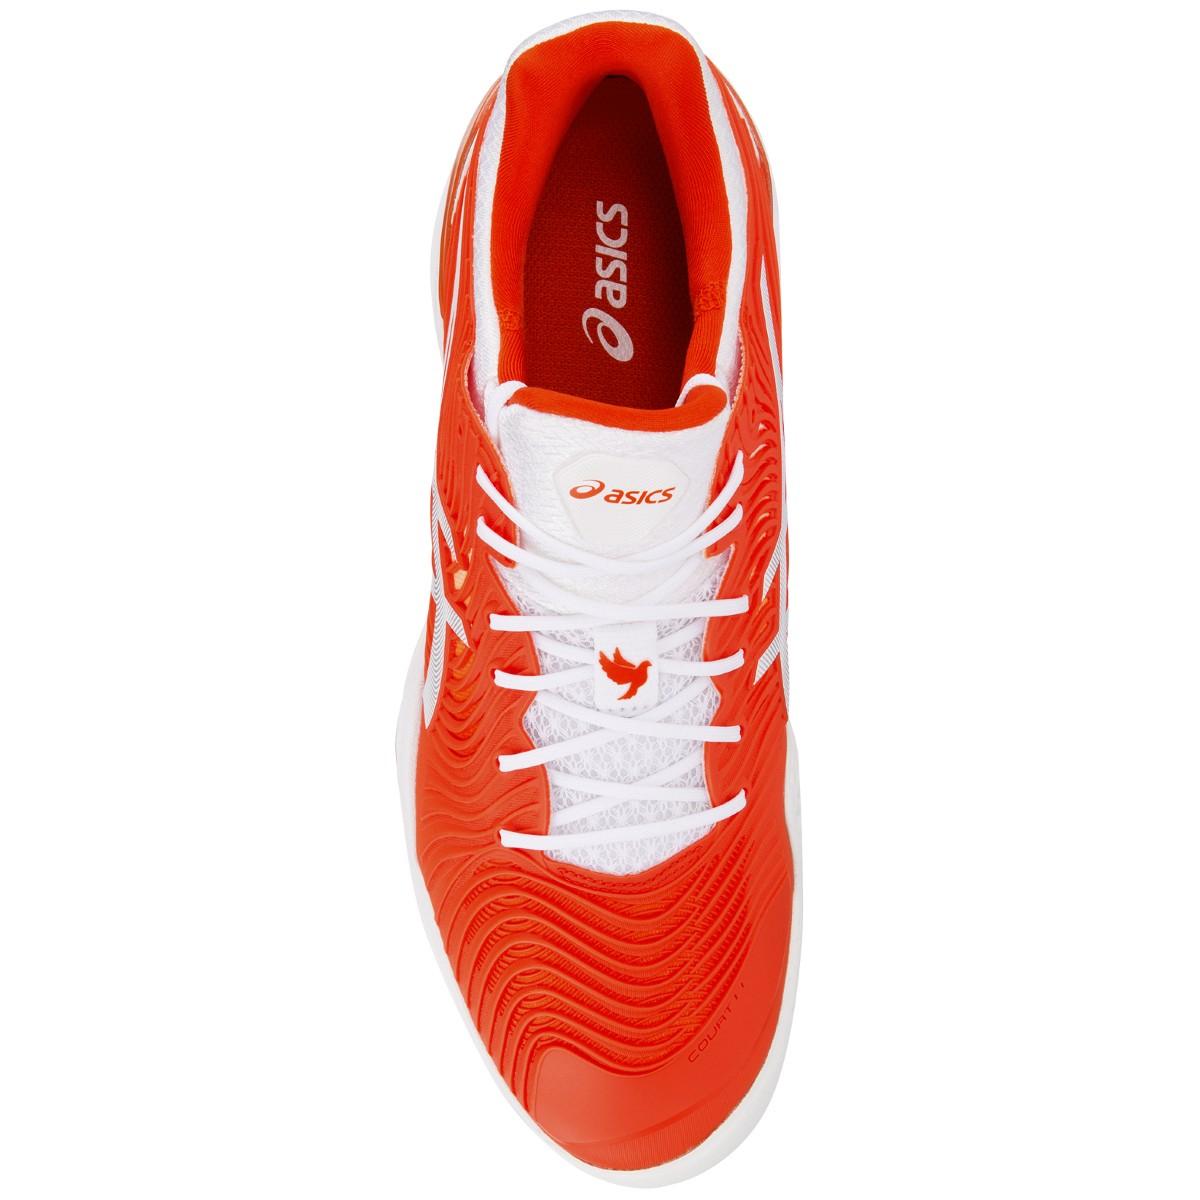 Chaussures Asics Court FF Djokovic Paris Toutes Surfaces